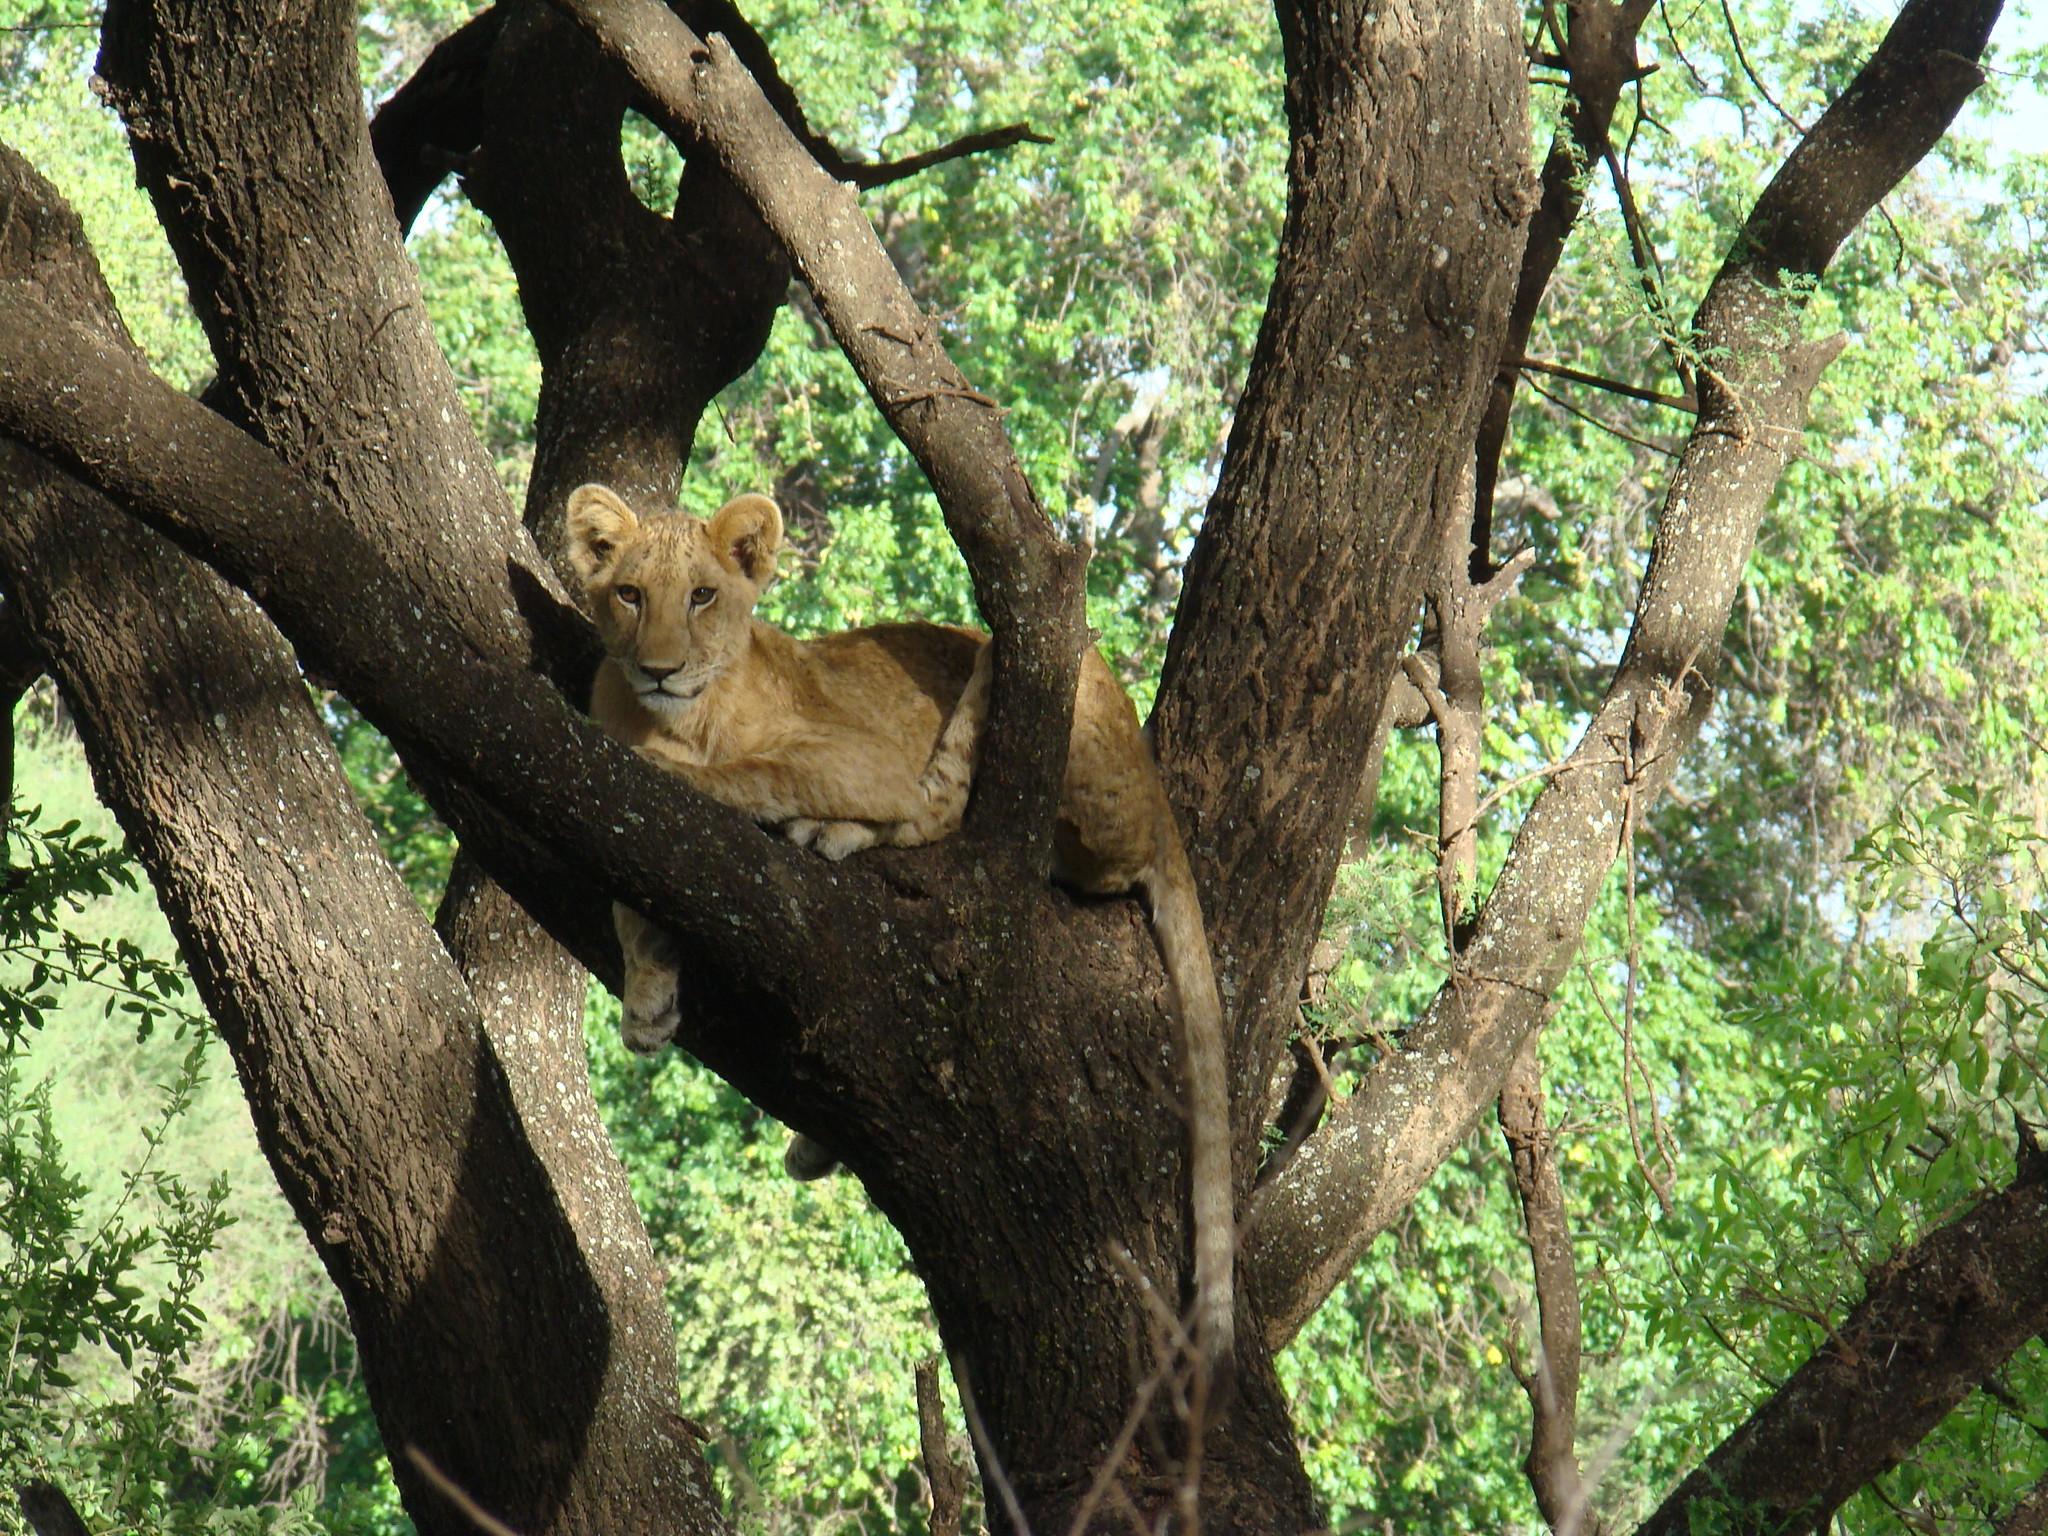 Leona sobre rama de arbol Safari Parque Nacional Lago Manyara Tanzania 07